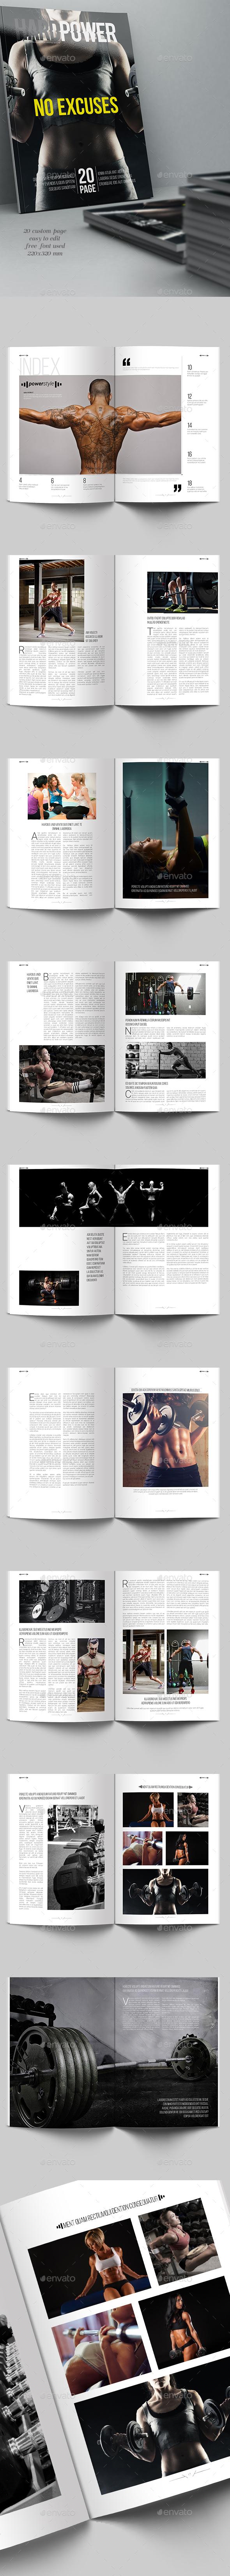 Hard Power Magazine Template - Magazines Print Templates